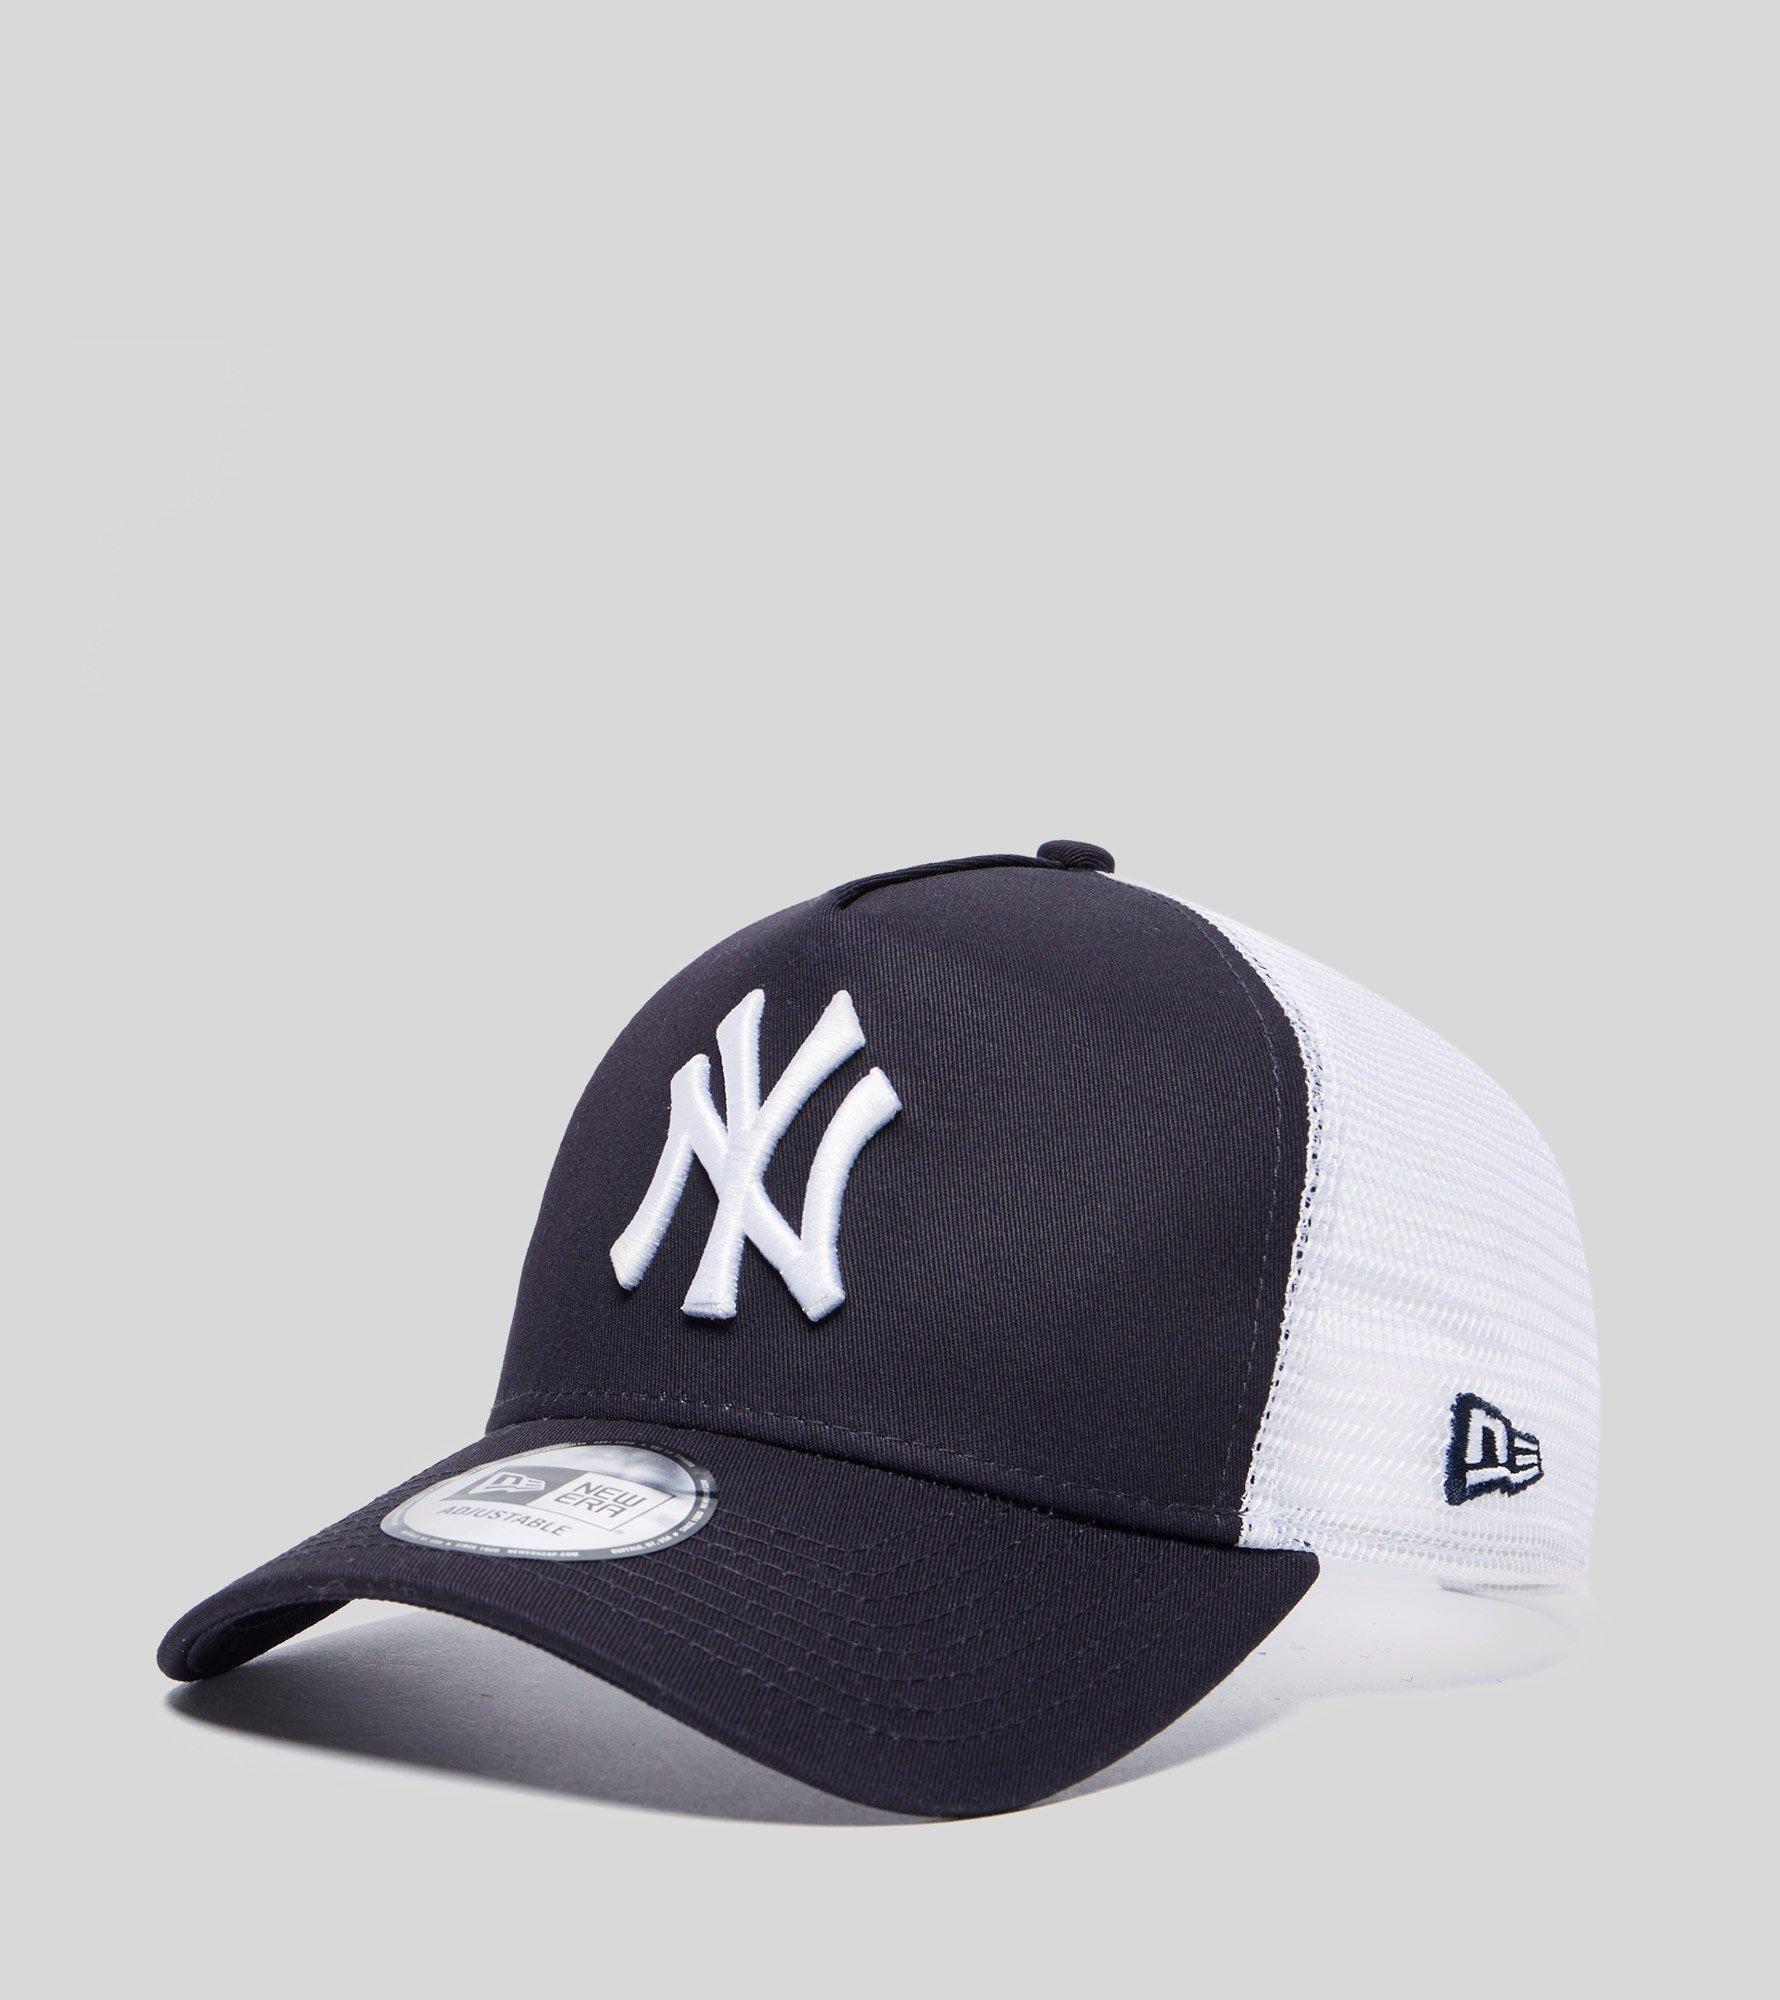 ddd03ad47a5 Ktz New York Yankees Trucker Cap in Blue for Men - Lyst